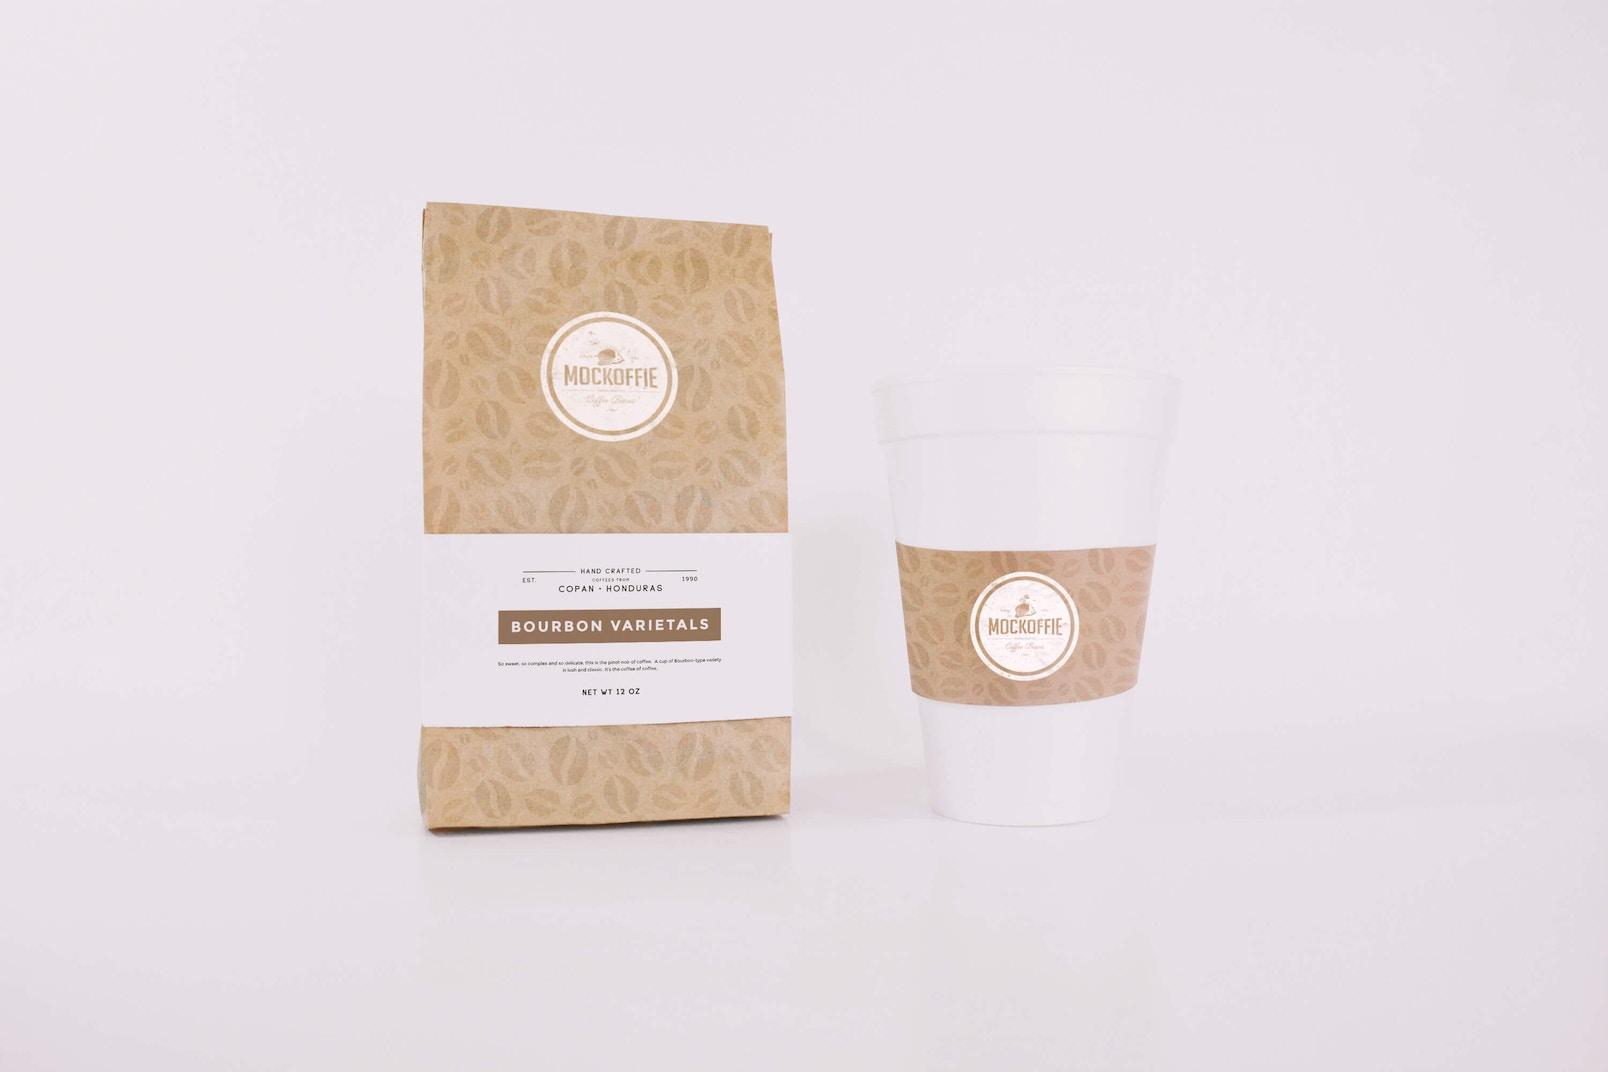 Coffee Bag and Cup Mockup